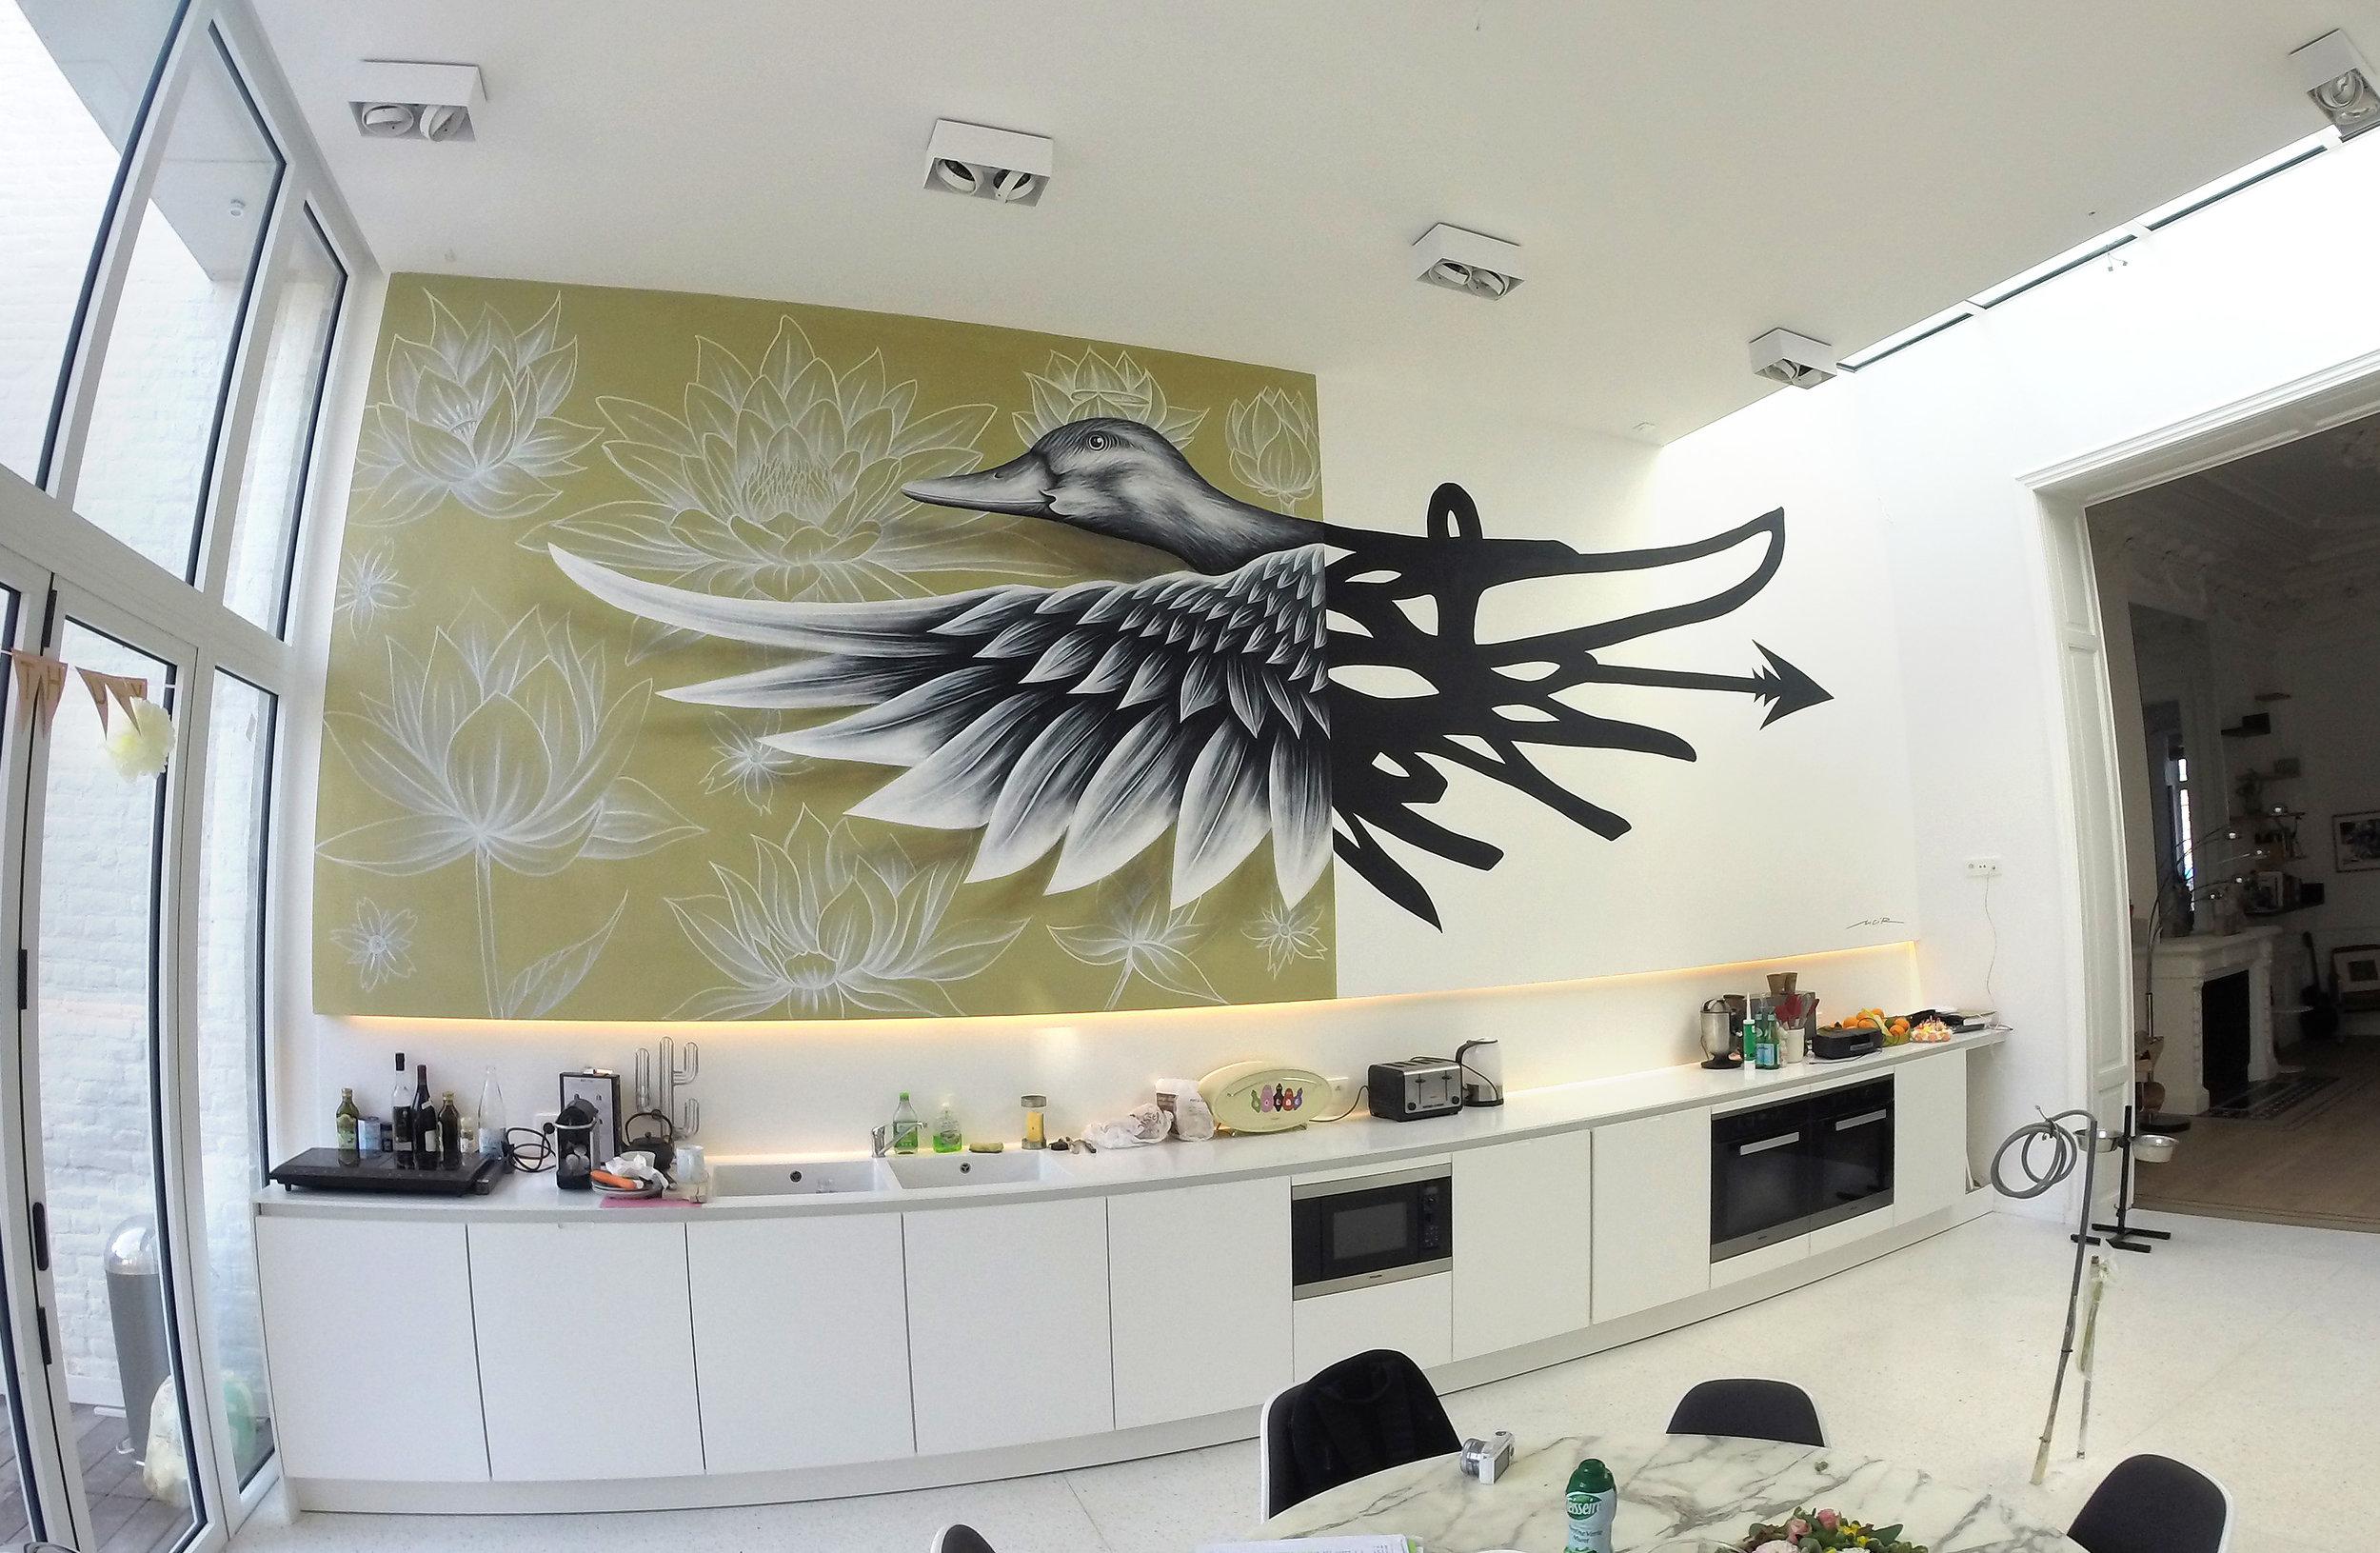 Mural painting - 10